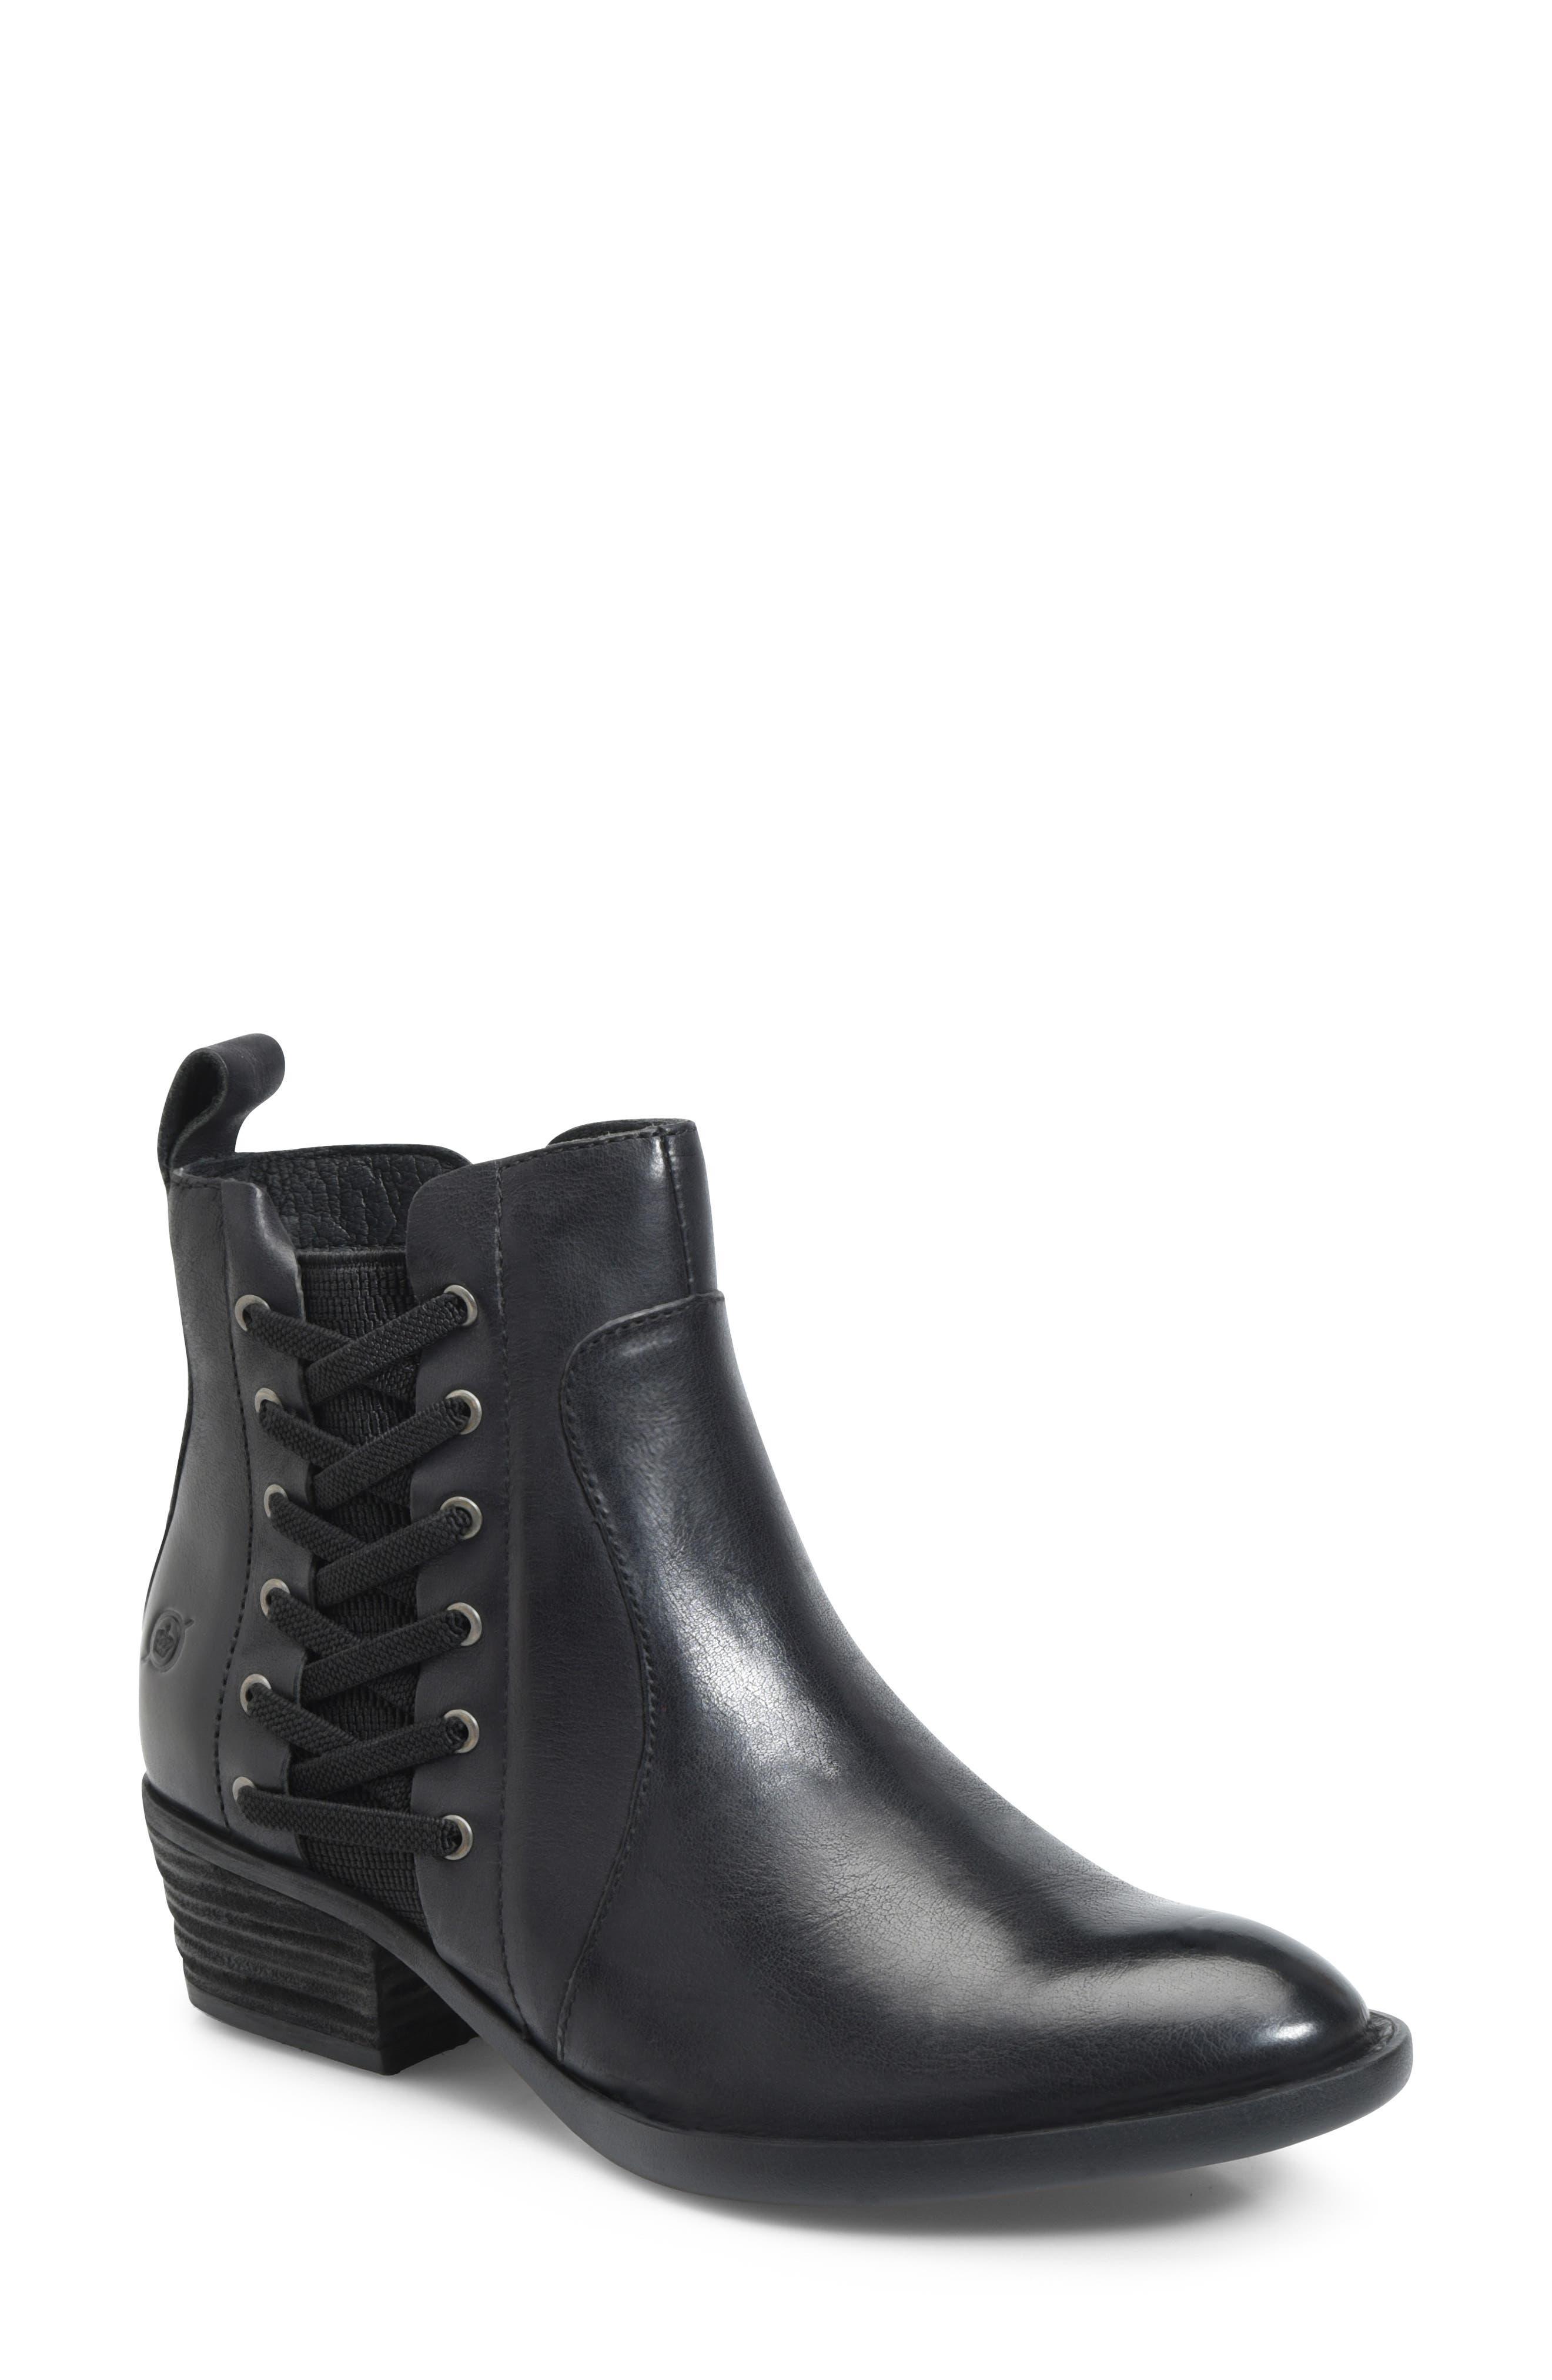 B?rn Dayle Boot, Black